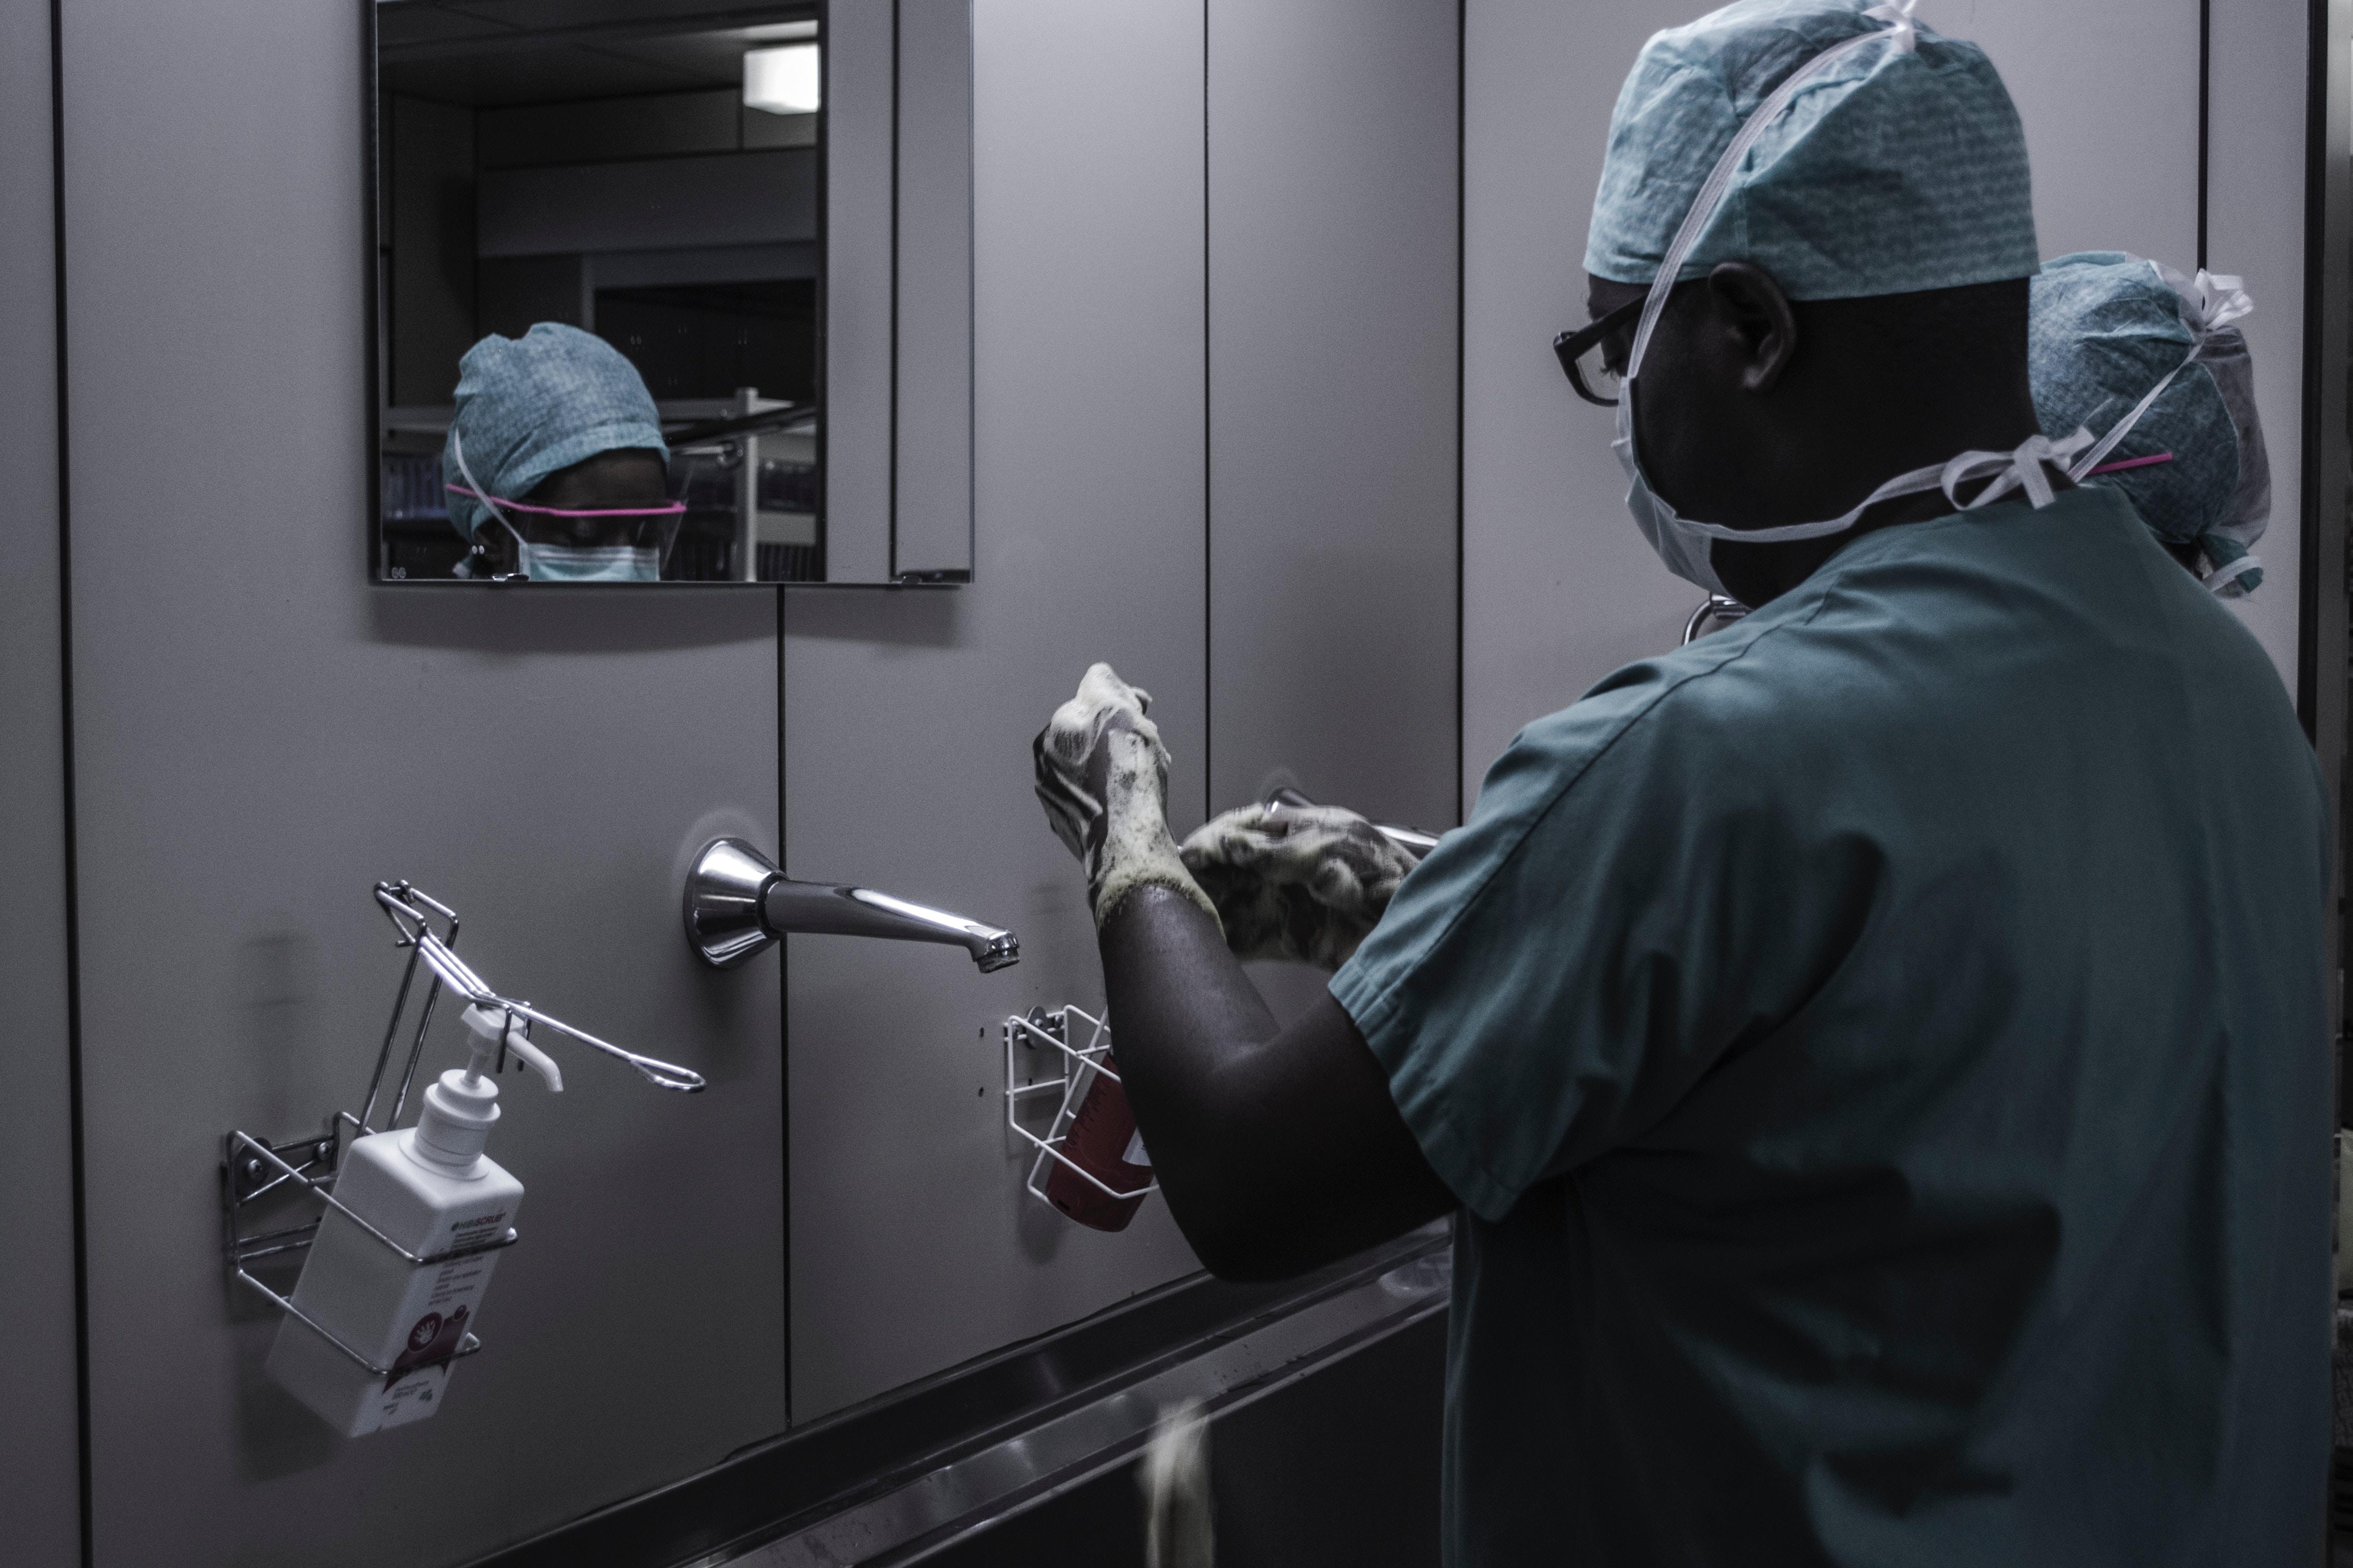 Chirurgie Generala: perspective de dezvoltare profesionala pentru medici si competente medicale